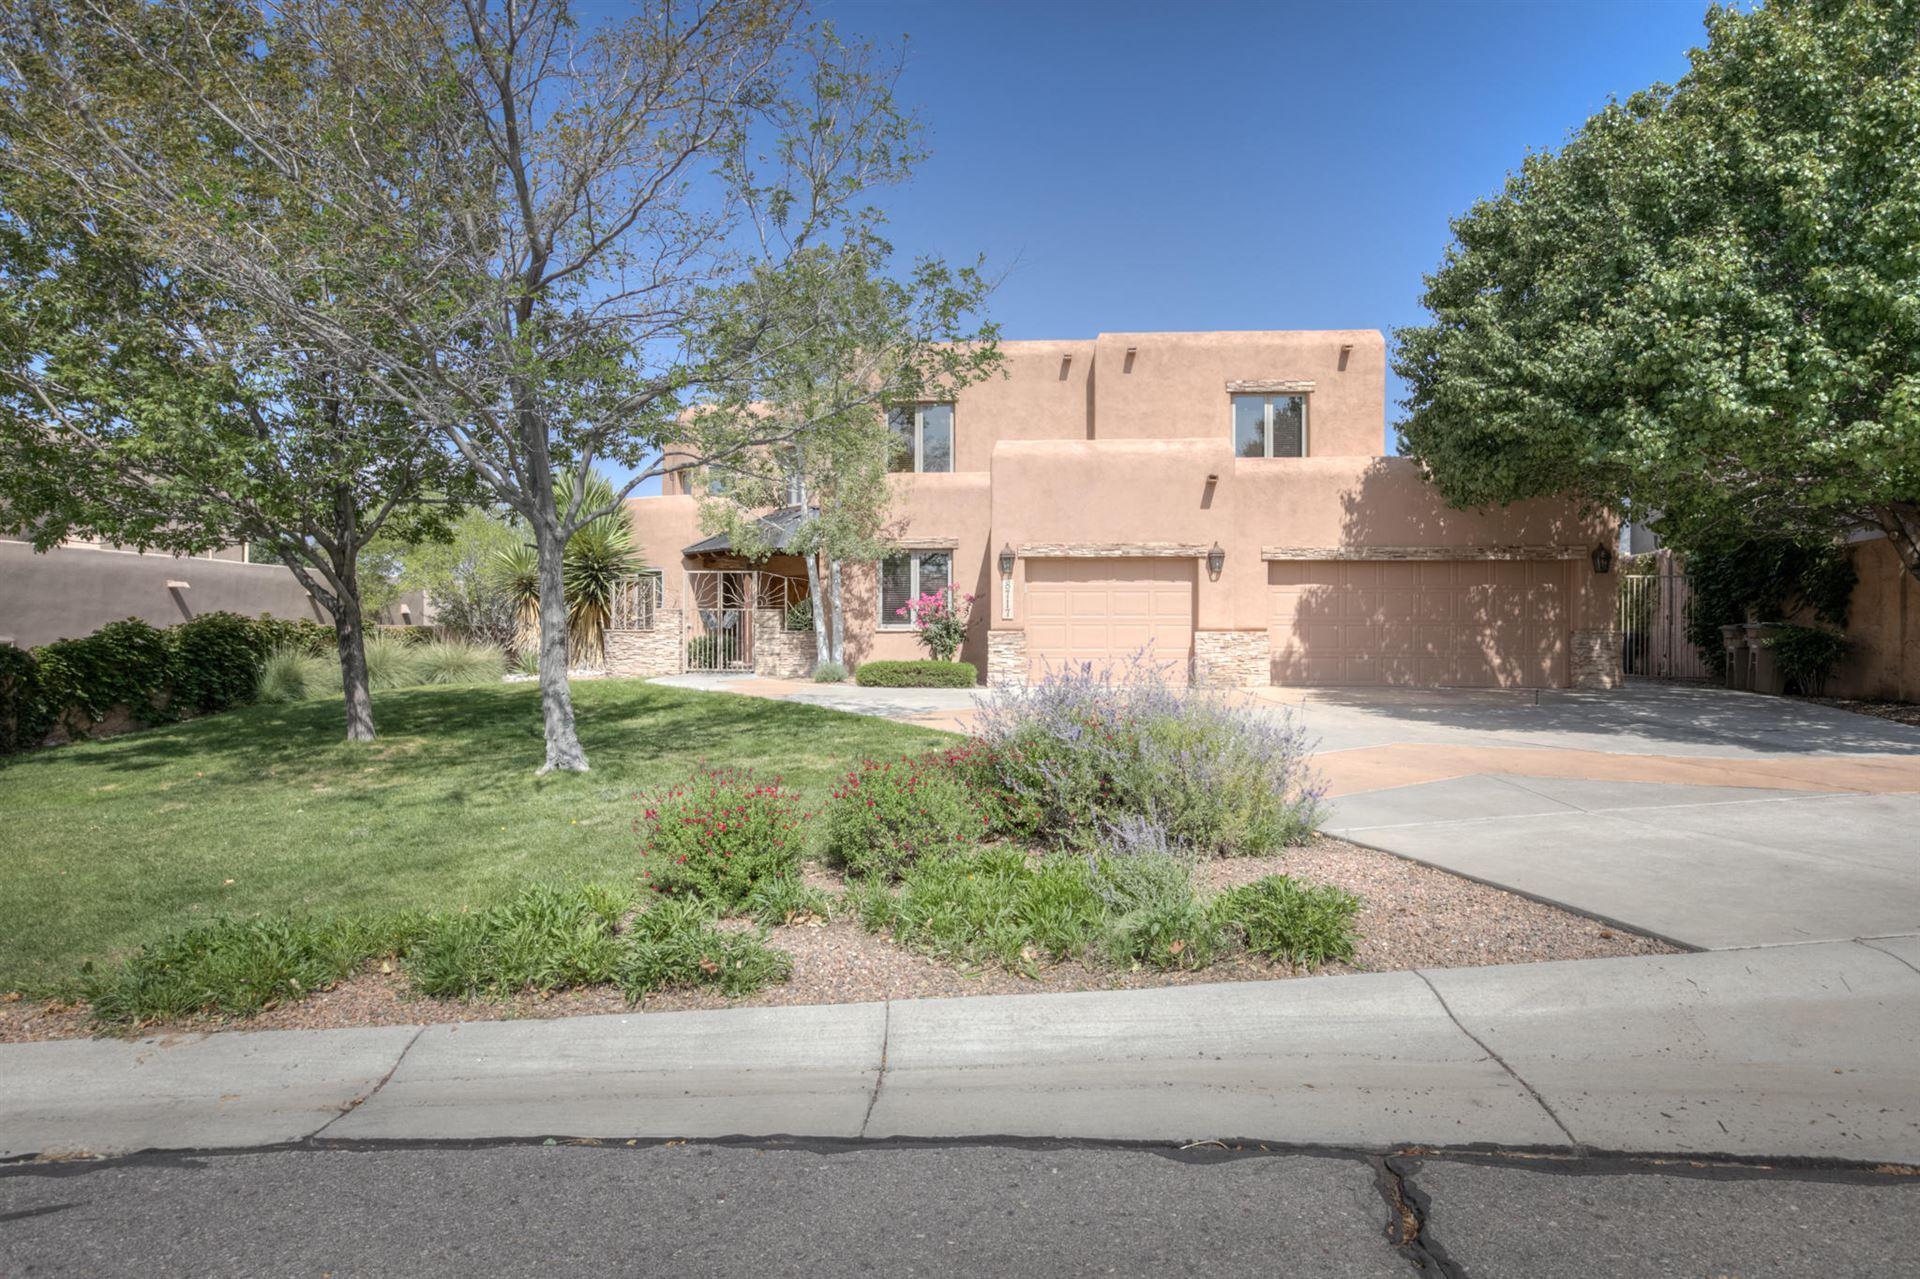 8717 ROYAL GLO Drive NE, Albuquerque, NM 87122 - MLS#: 994117